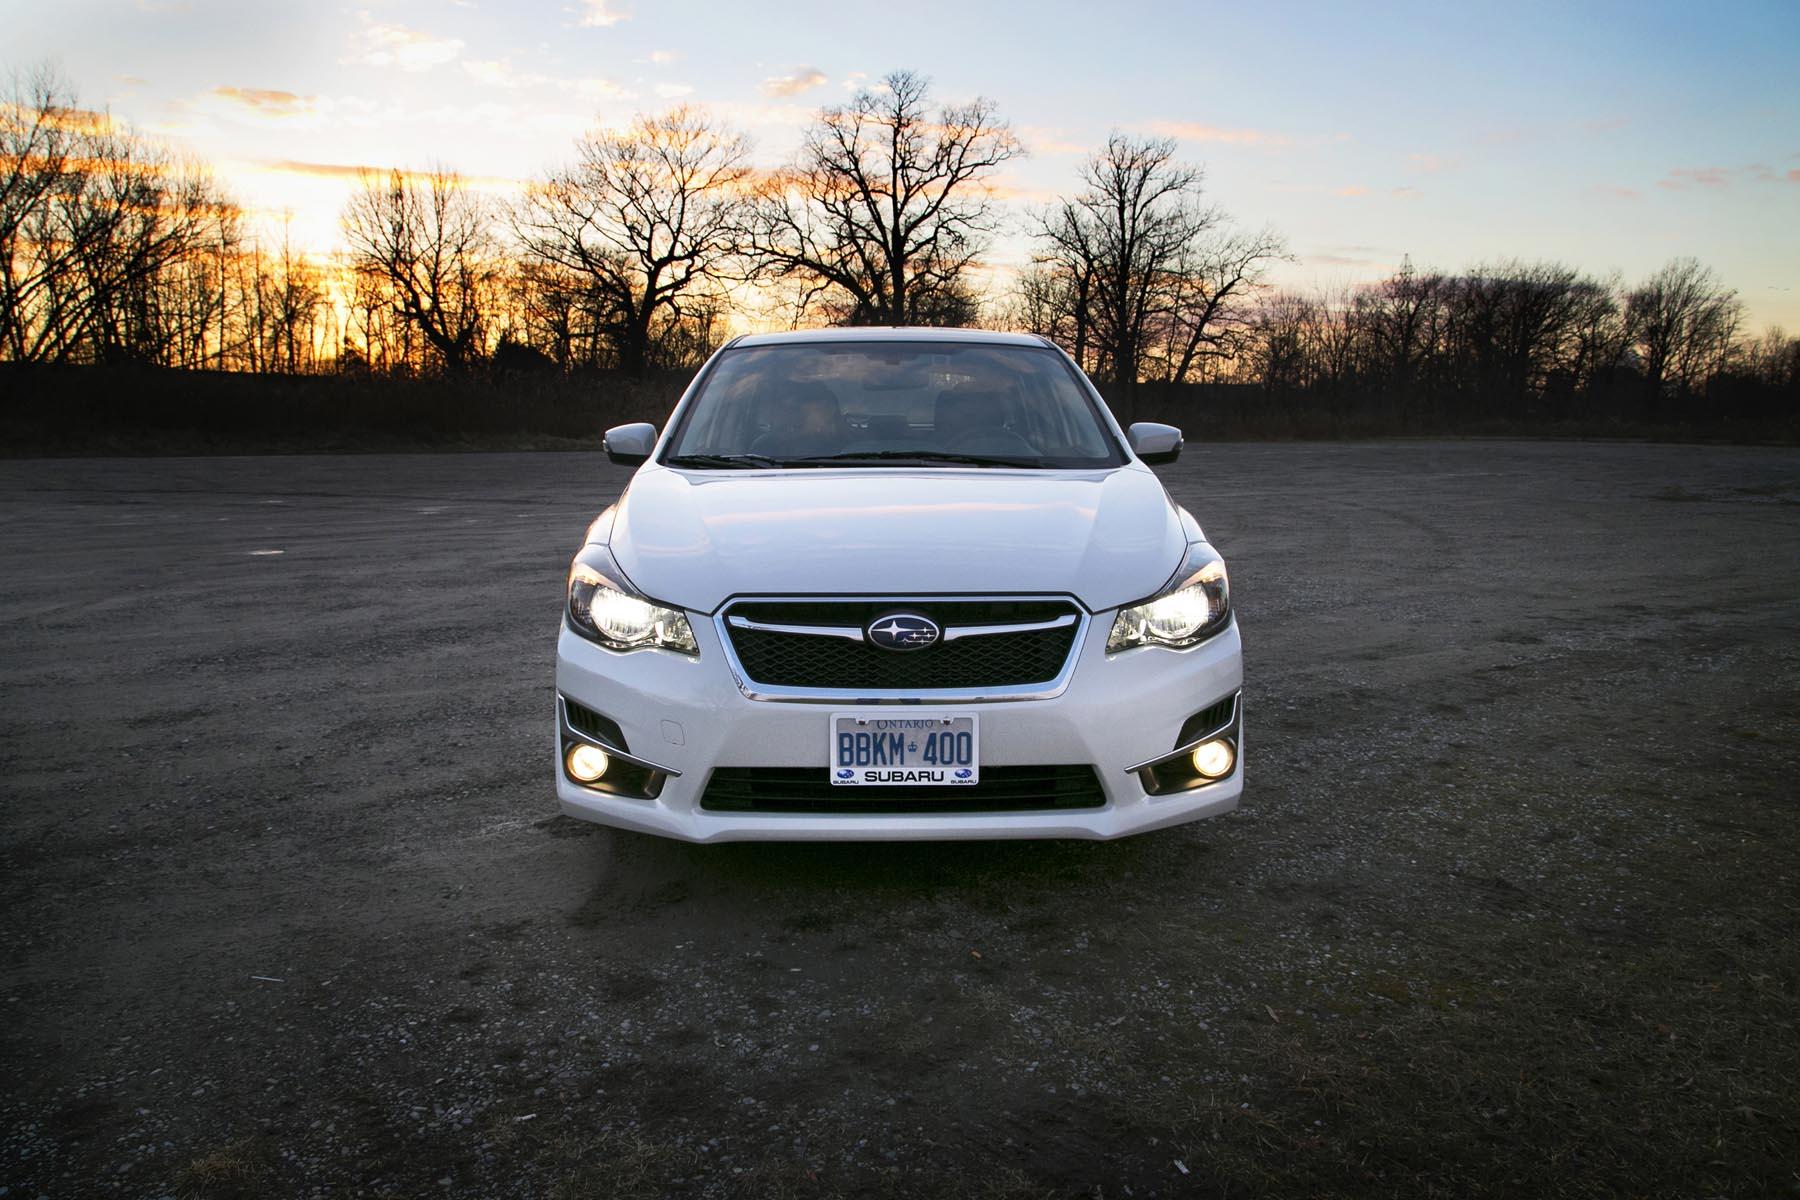 2015 subaru impreza 2.0i limited 5-door - autos.ca